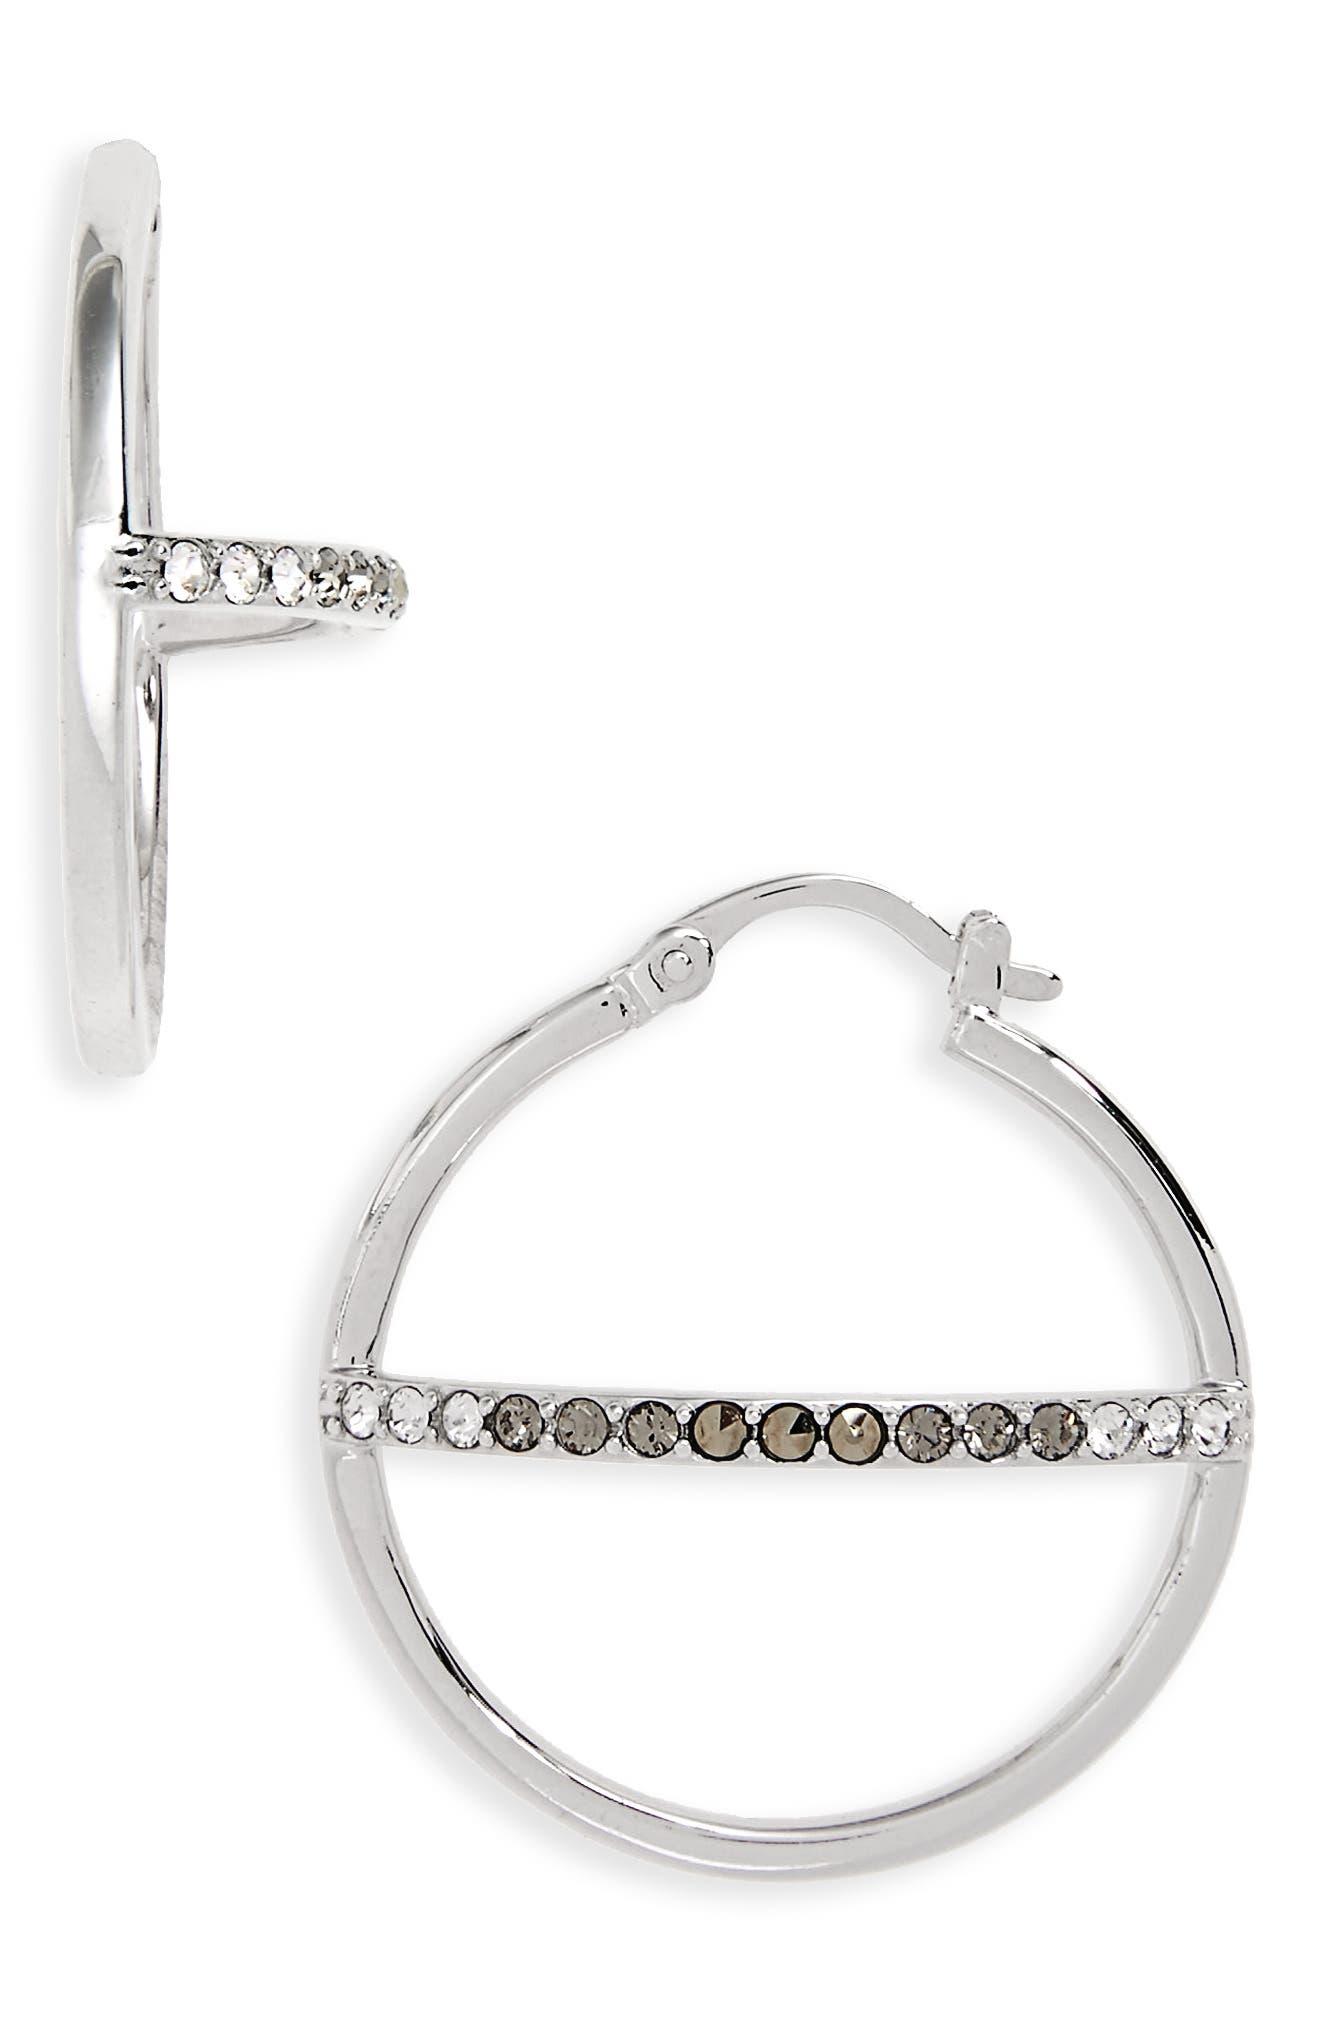 Silver Sparkle Hoop Earrings,                             Main thumbnail 1, color,                             040